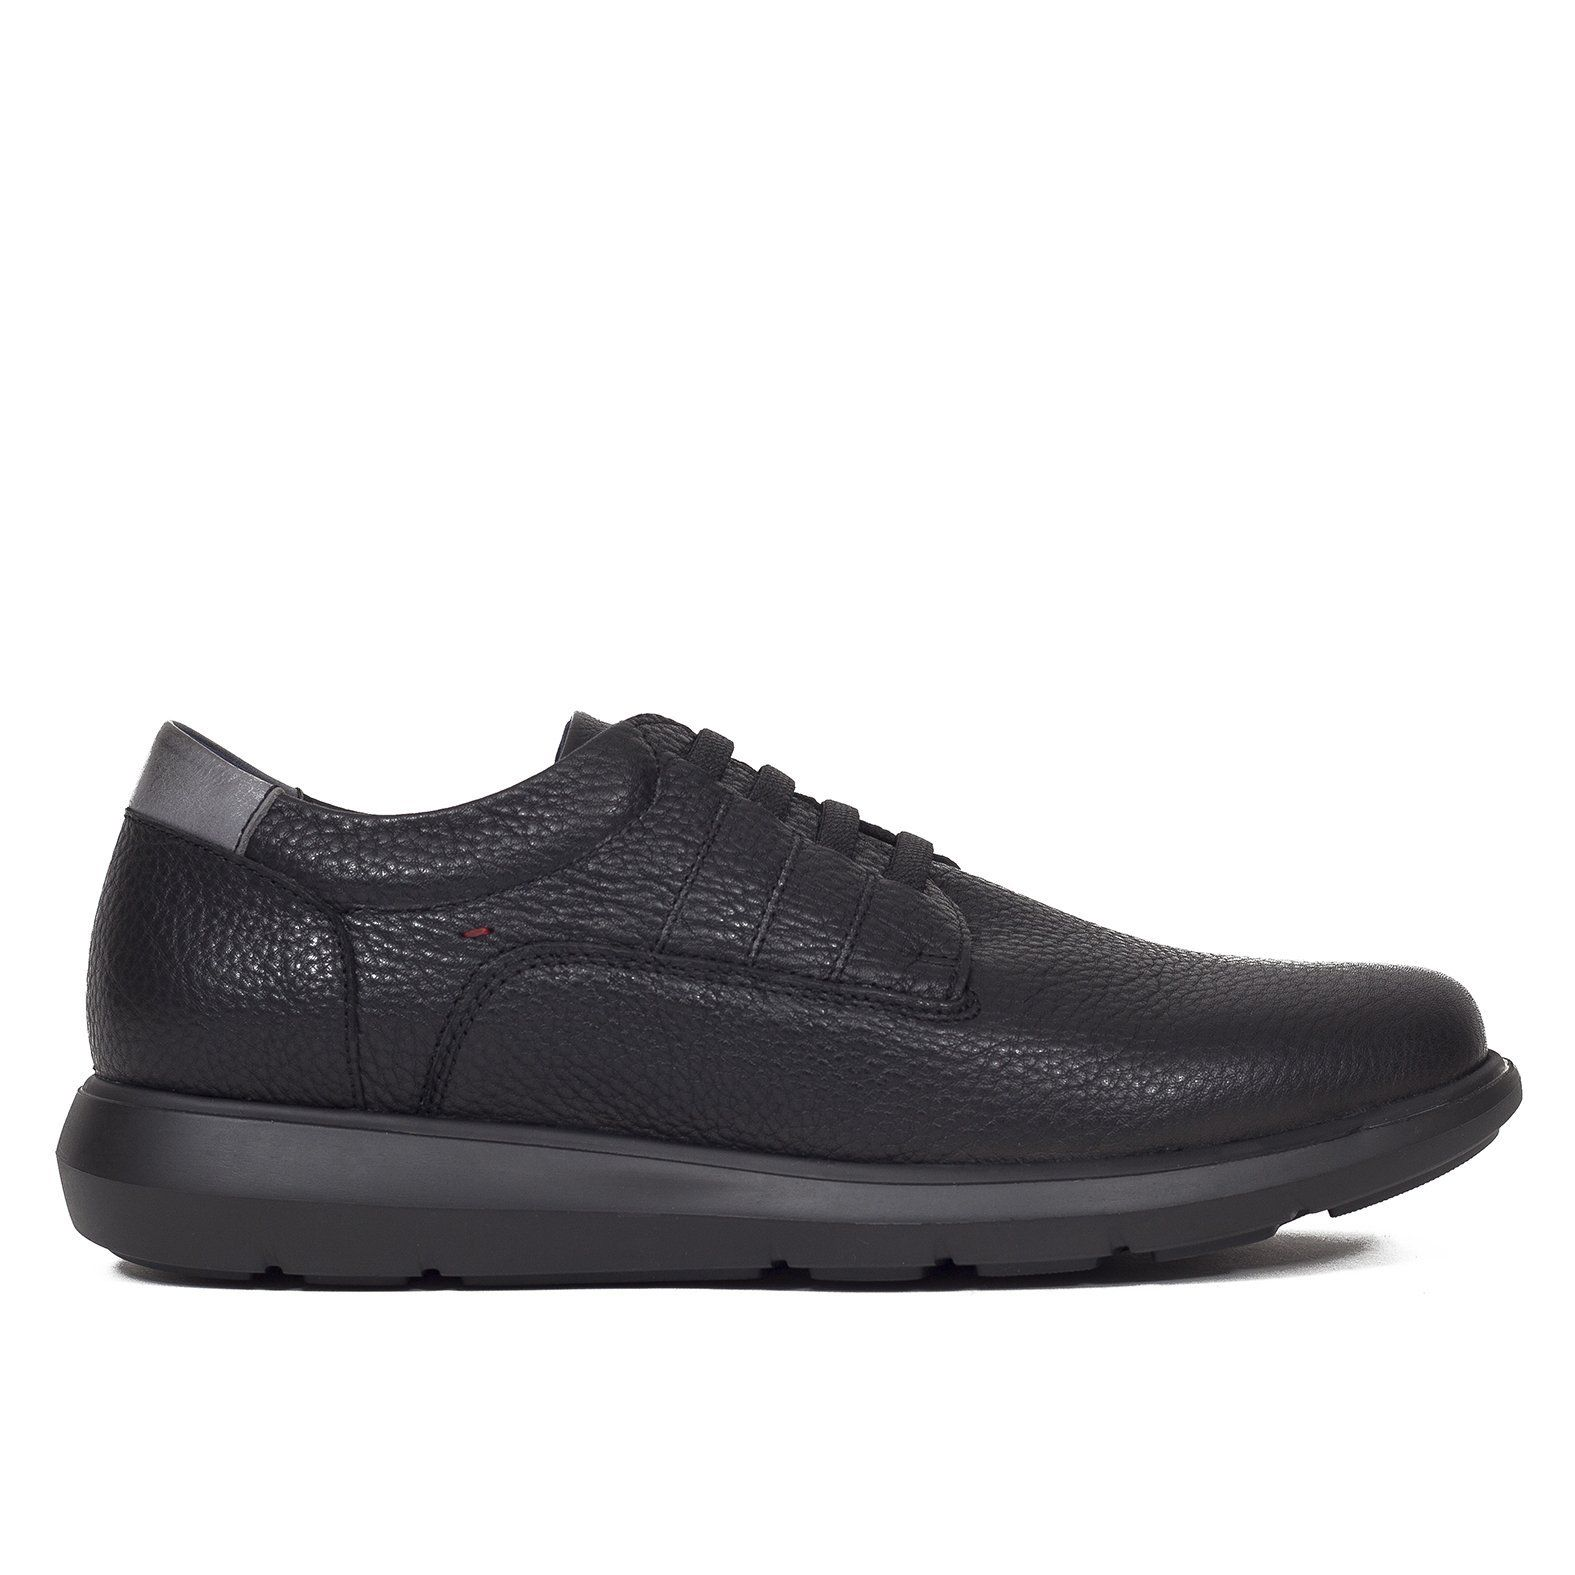 20a1f387cff Zapato hombre NEGRO deportivo - Zapatos online miMaO – miMaO ShopOnline